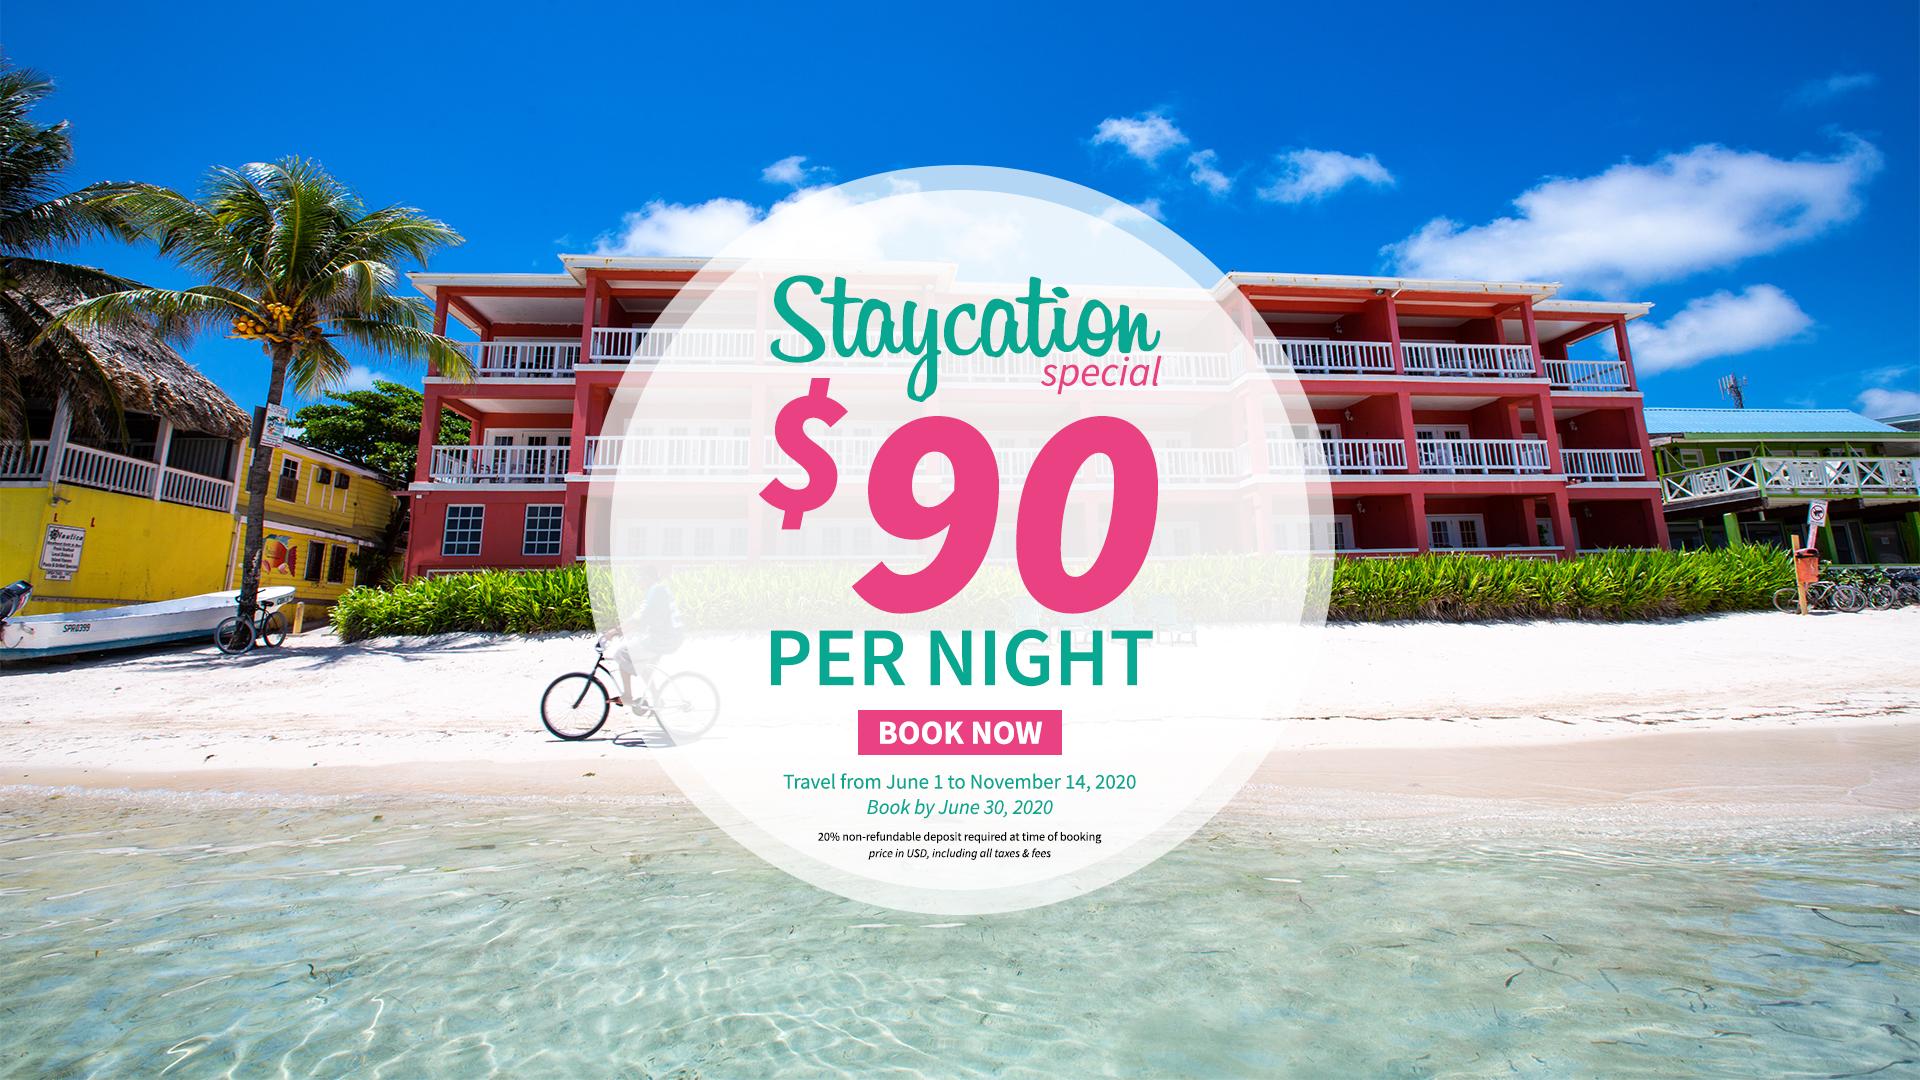 Staycation Special - Mayan Princess Hotel, Belize